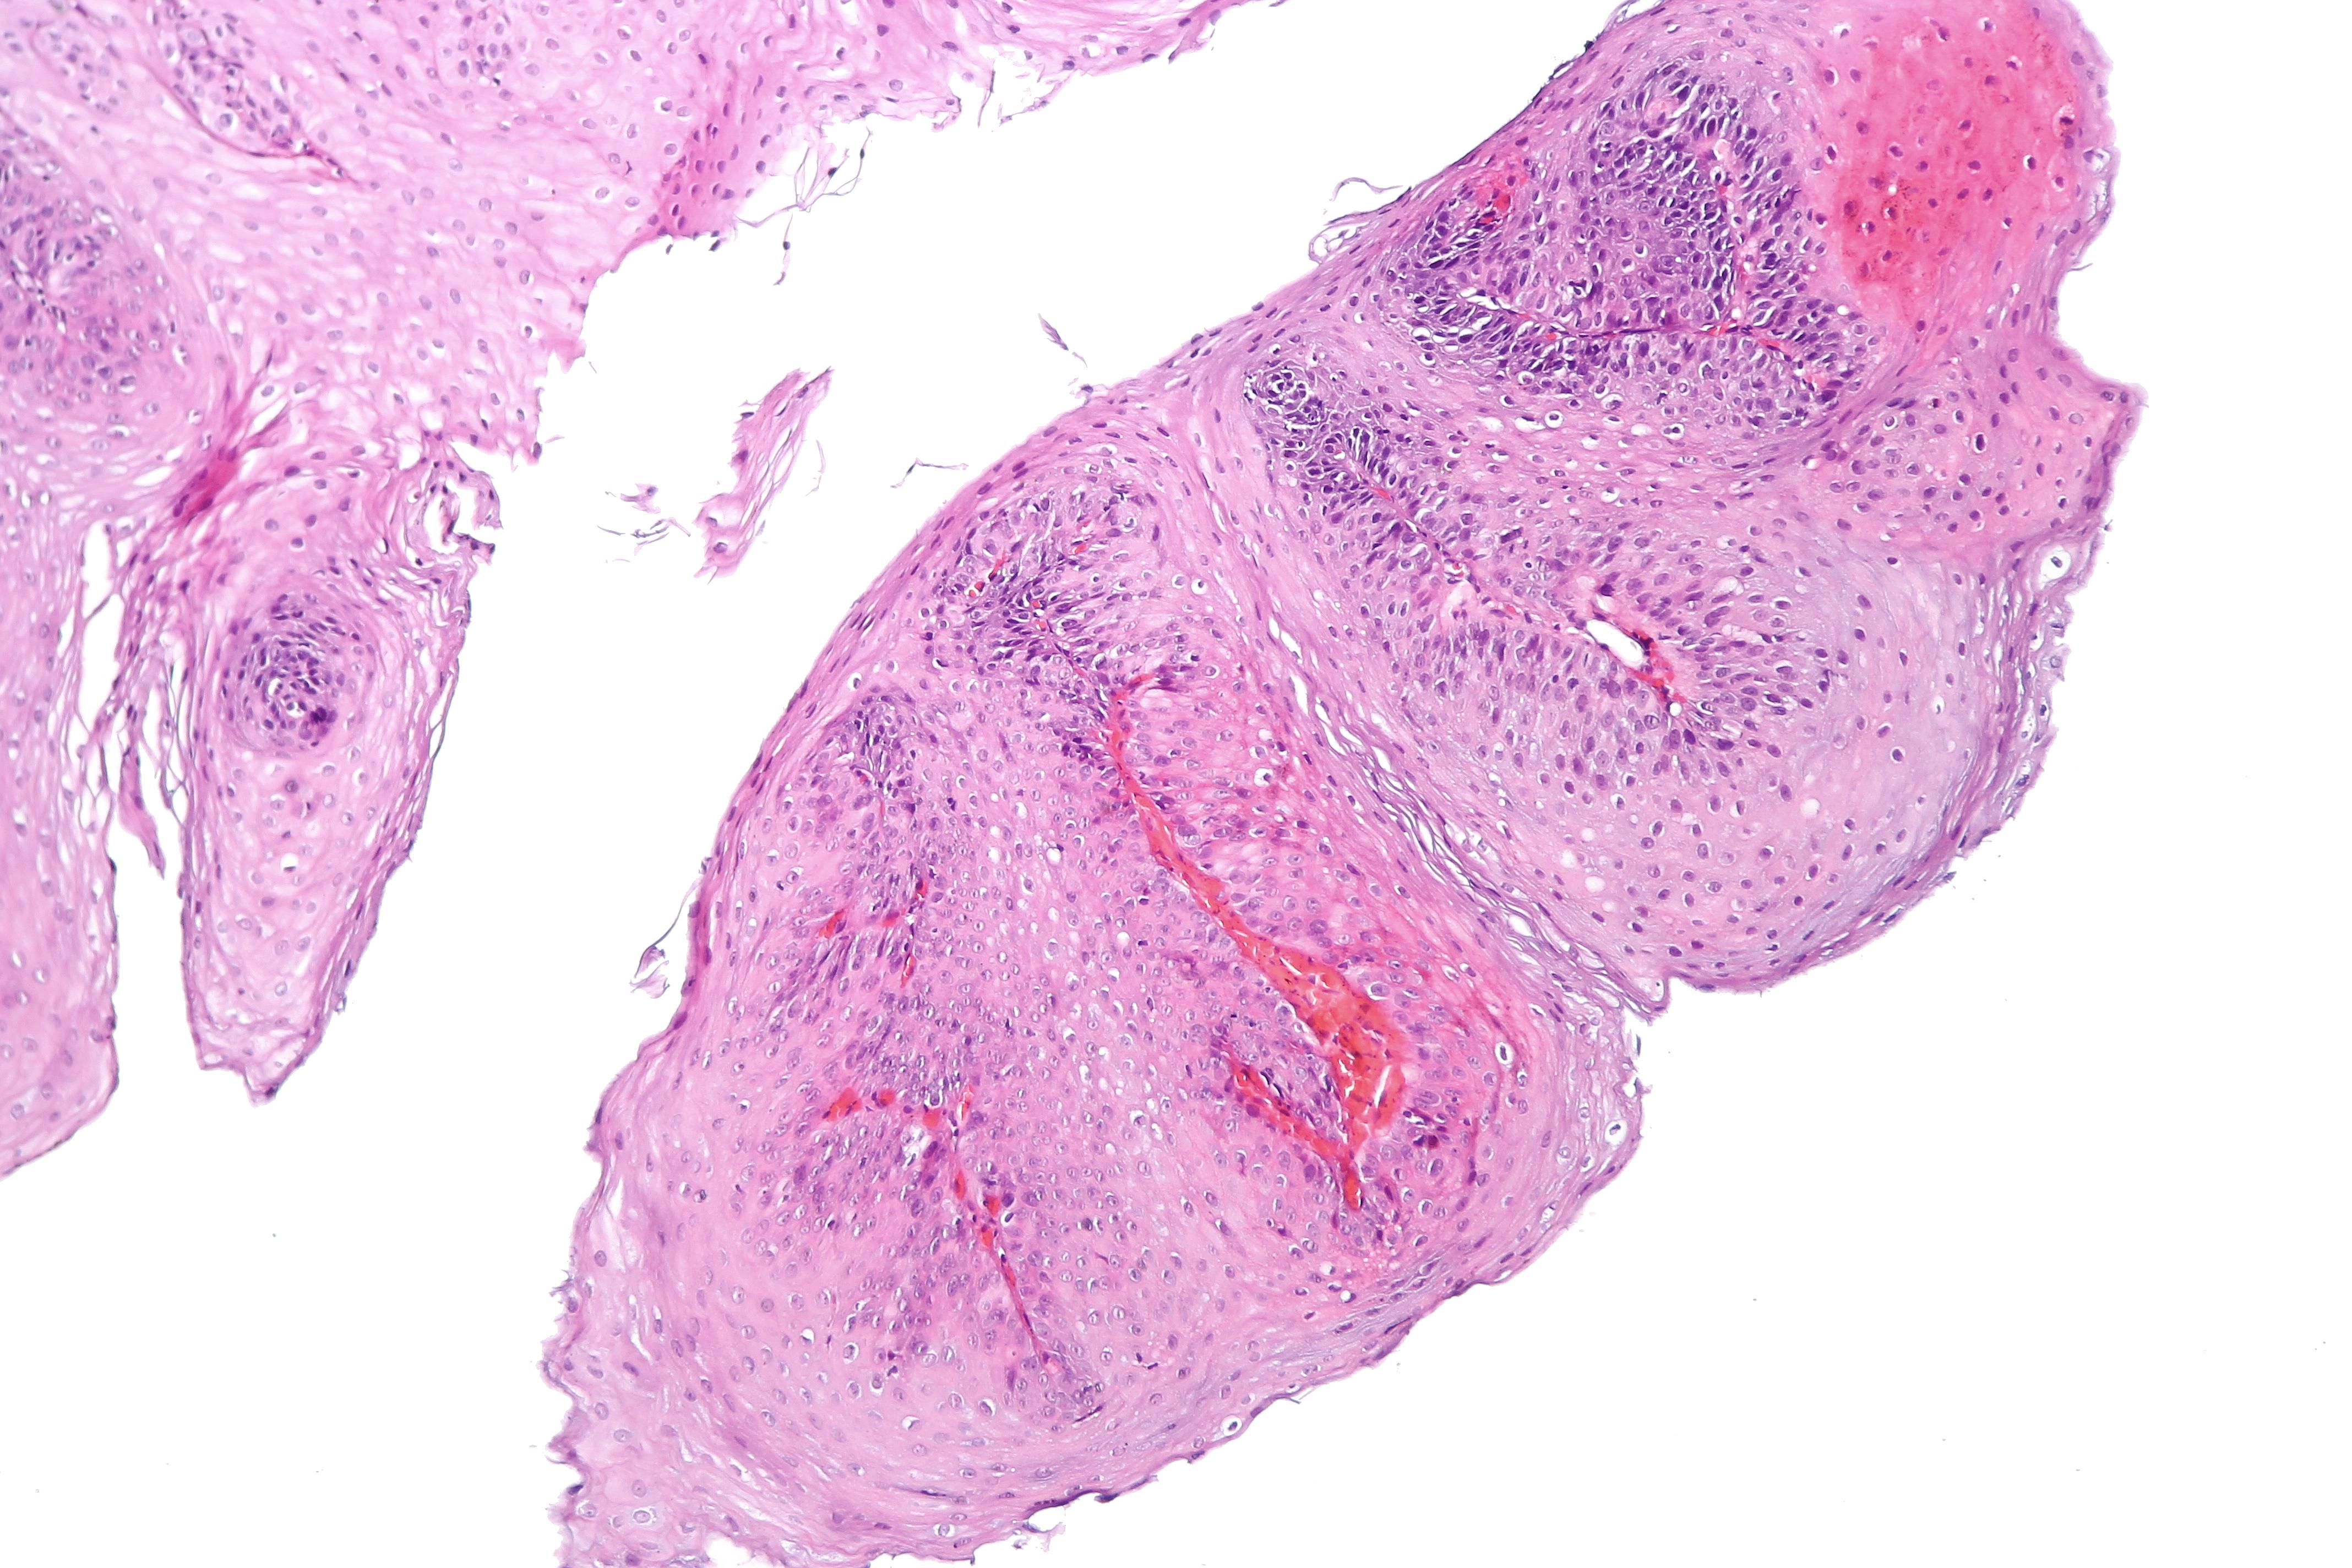 Squamous papilloma meaning in hindi. Quali sono i sintomi del papilloma virus